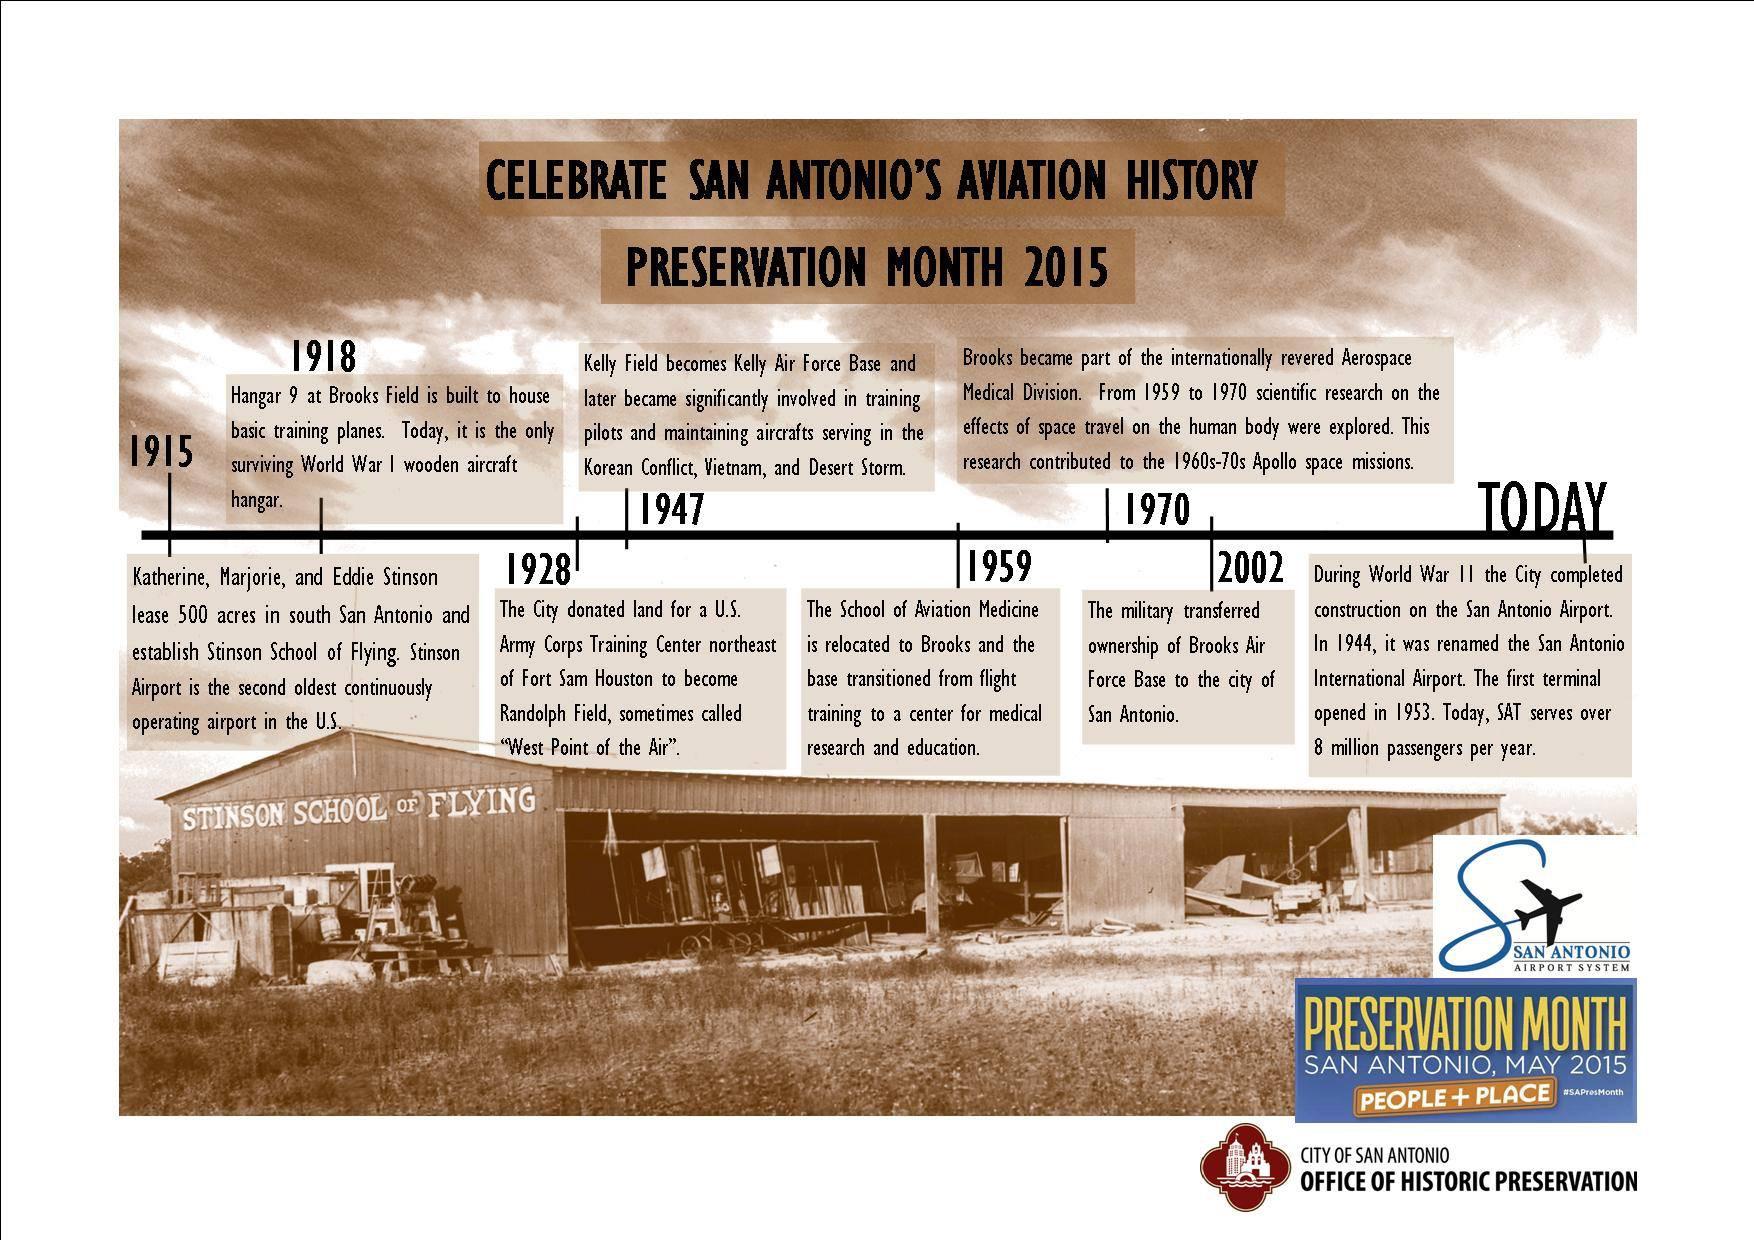 City of San Antonio Office of Historic Preservation